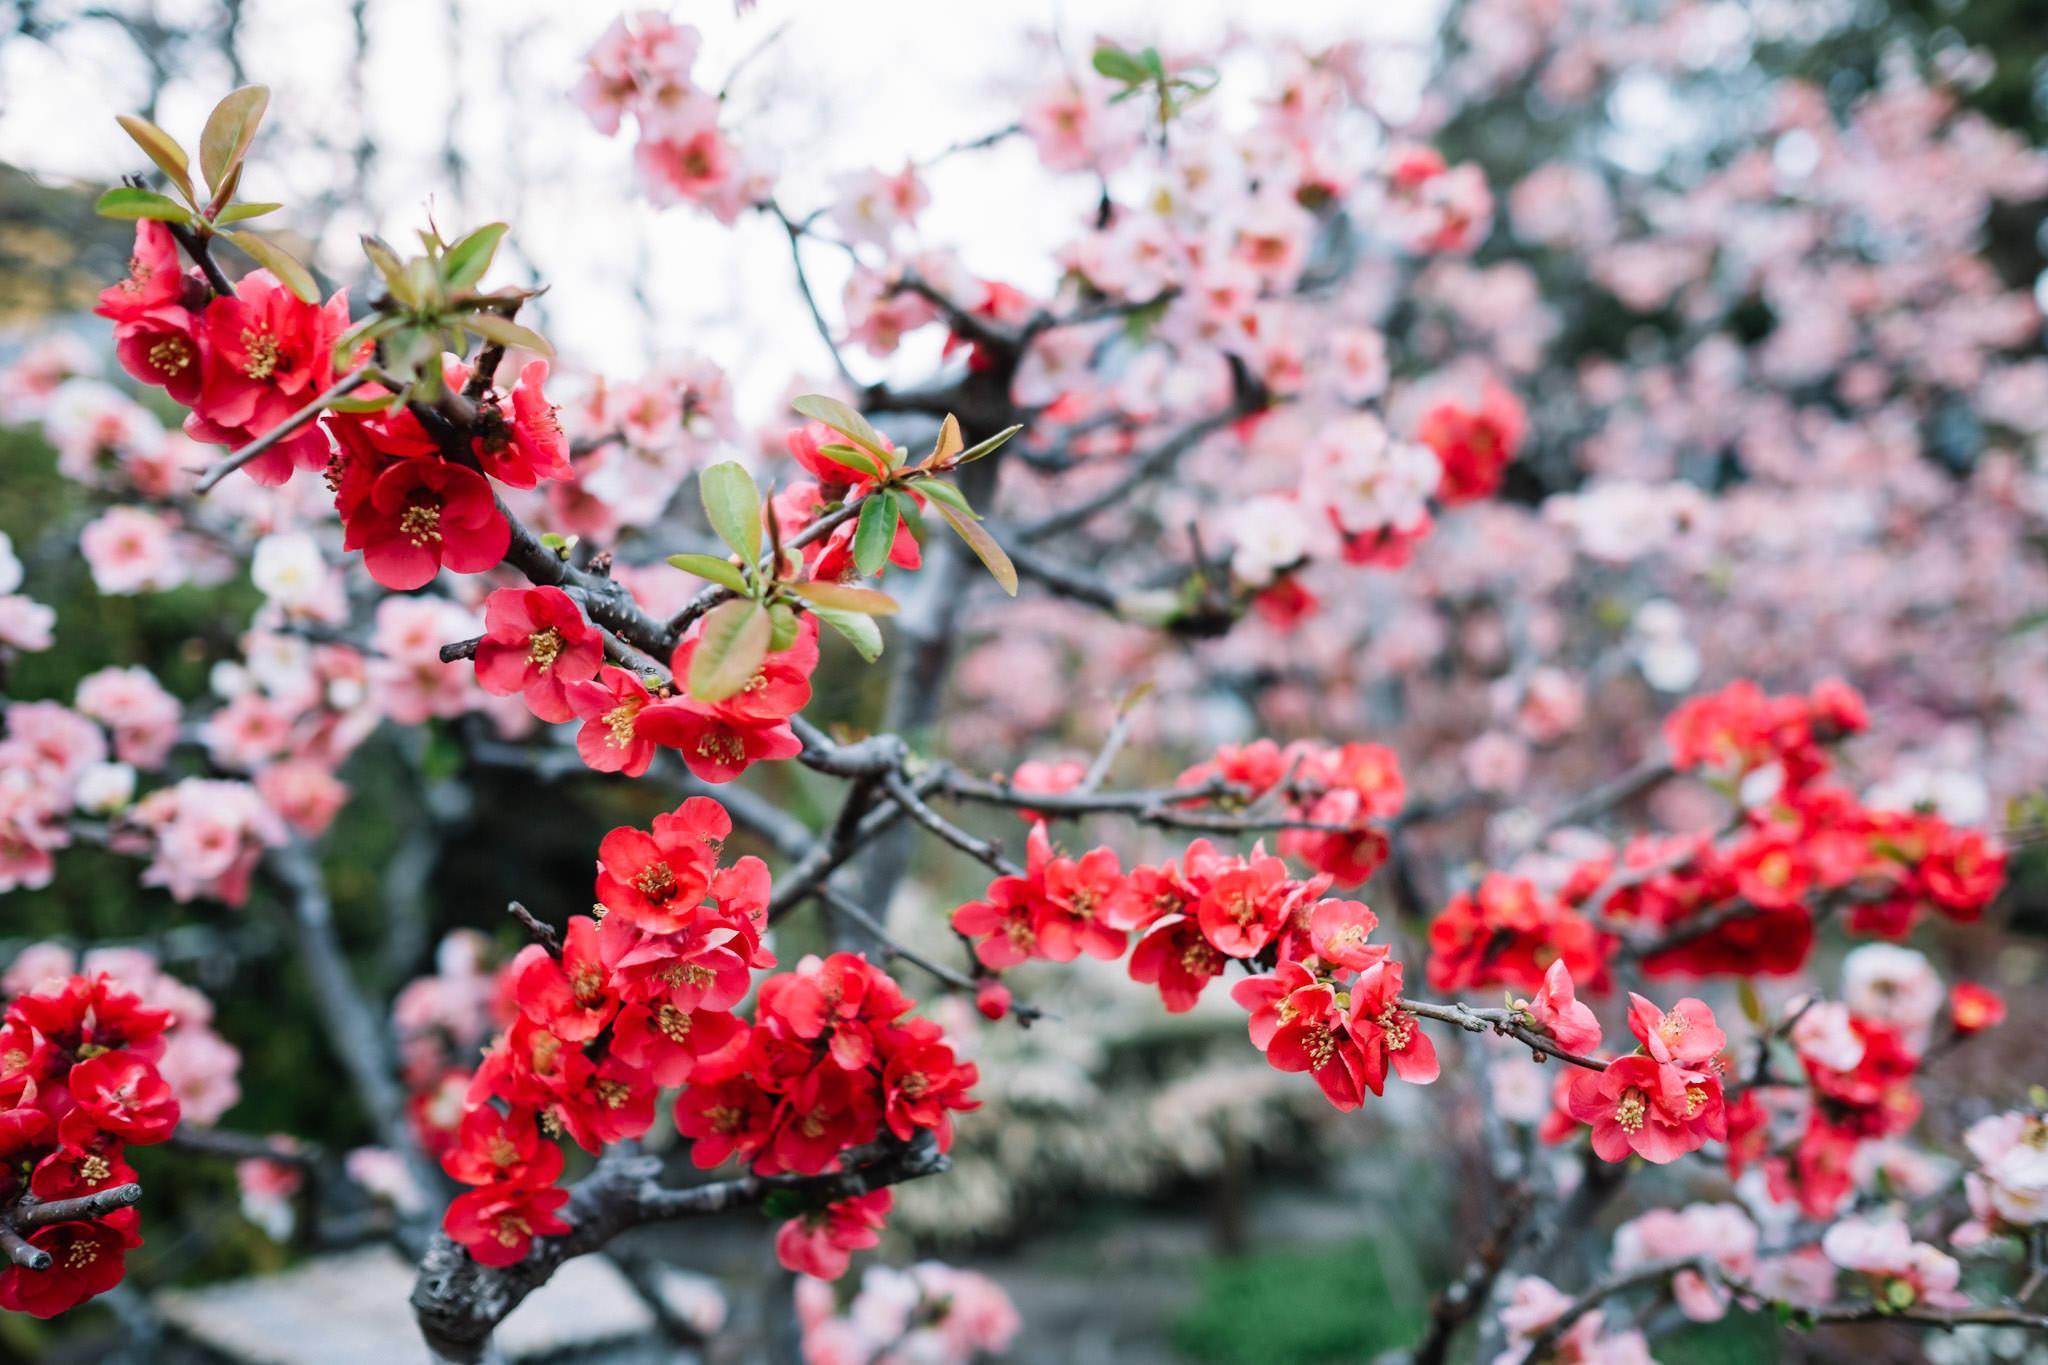 chris_eberhardt_japan_travel_reise_nippon-17.jpg